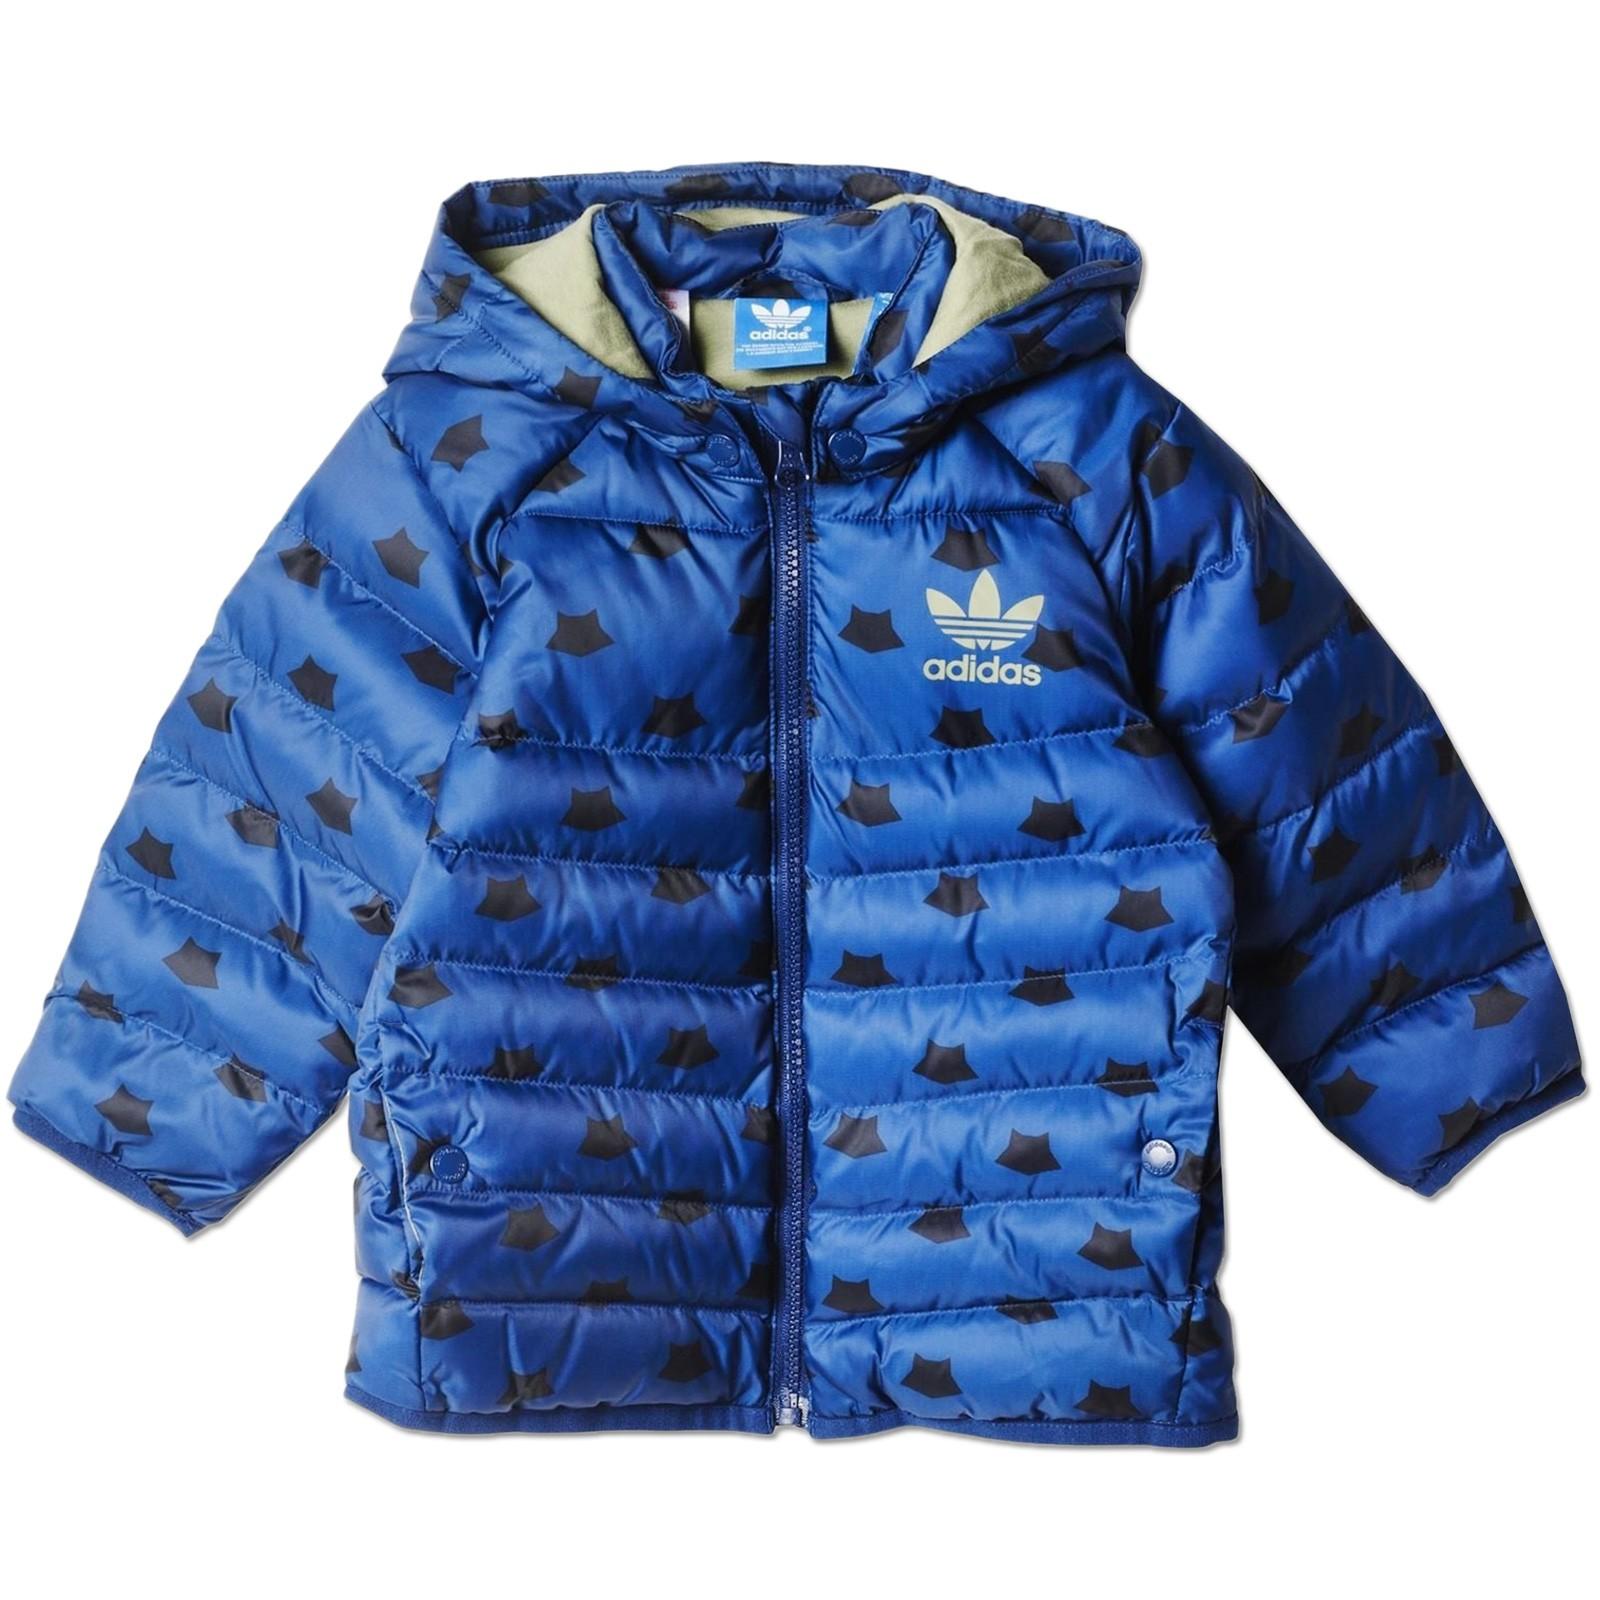 adidas Originals Baby & Kinder MF Jungen Padded Jacke Winterjacke Waschbär  Blau